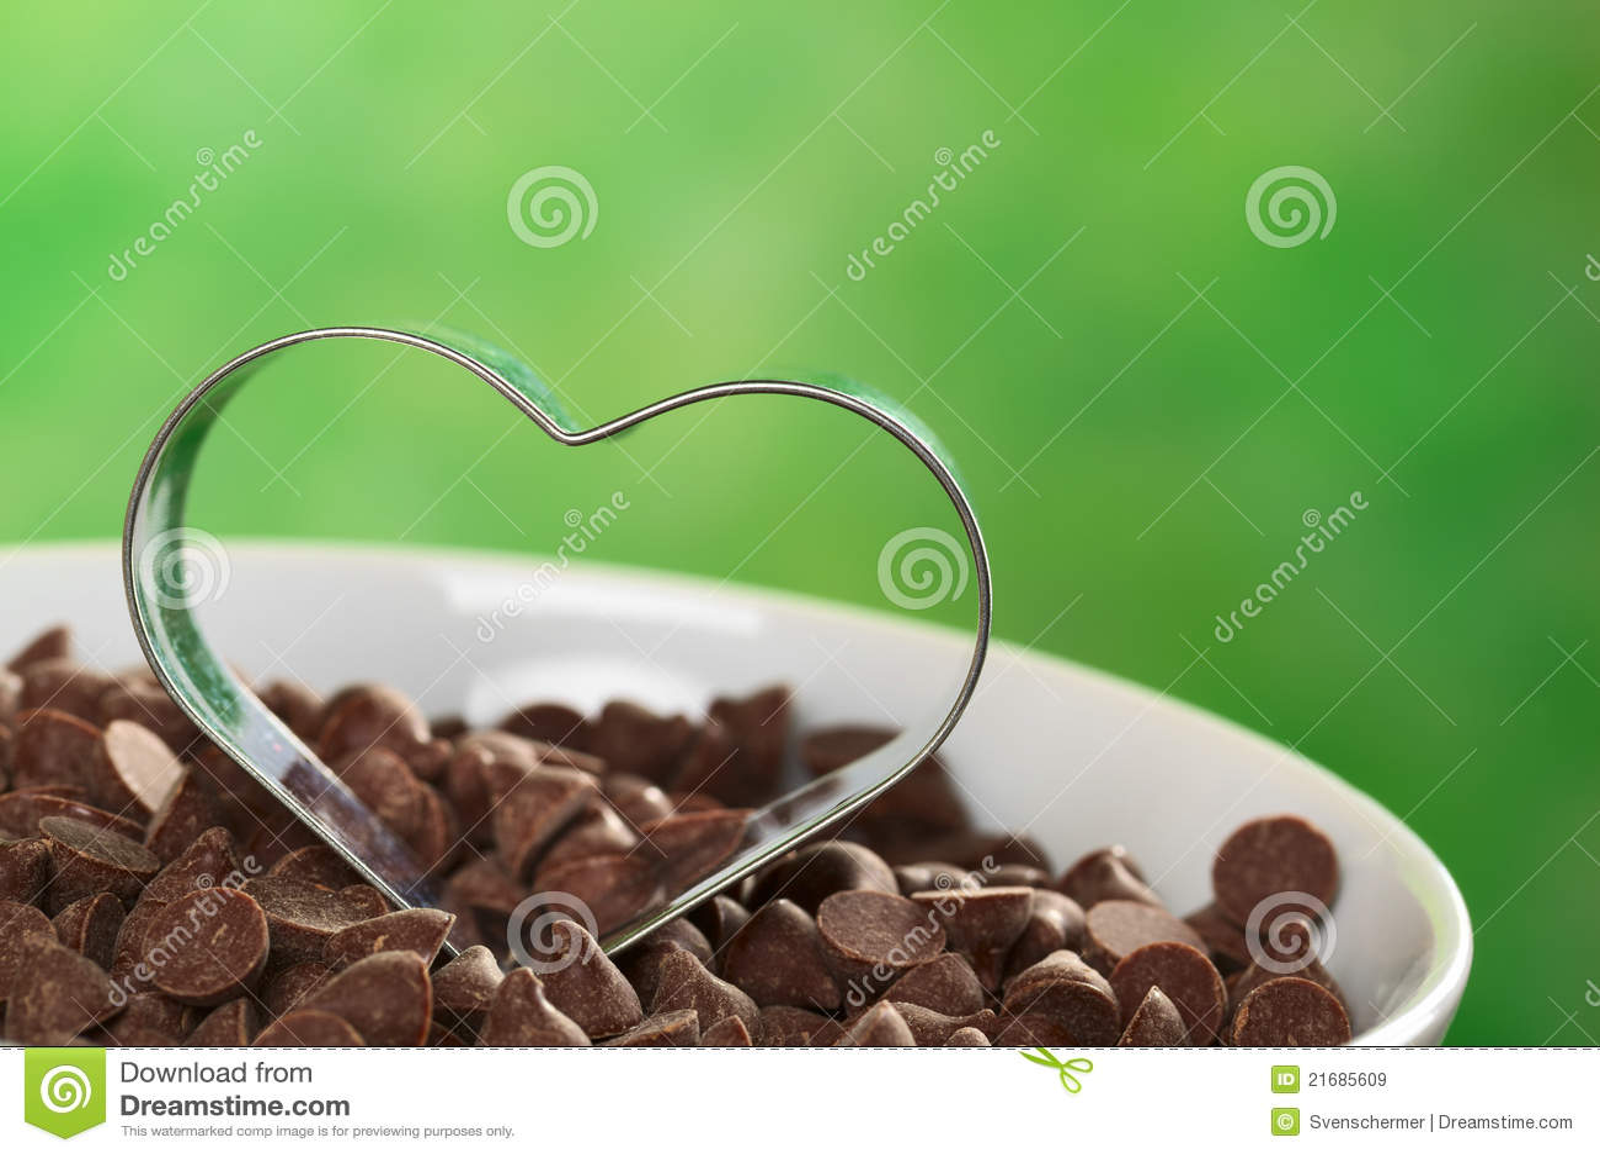 Heart-Shaped Cookie Cutter